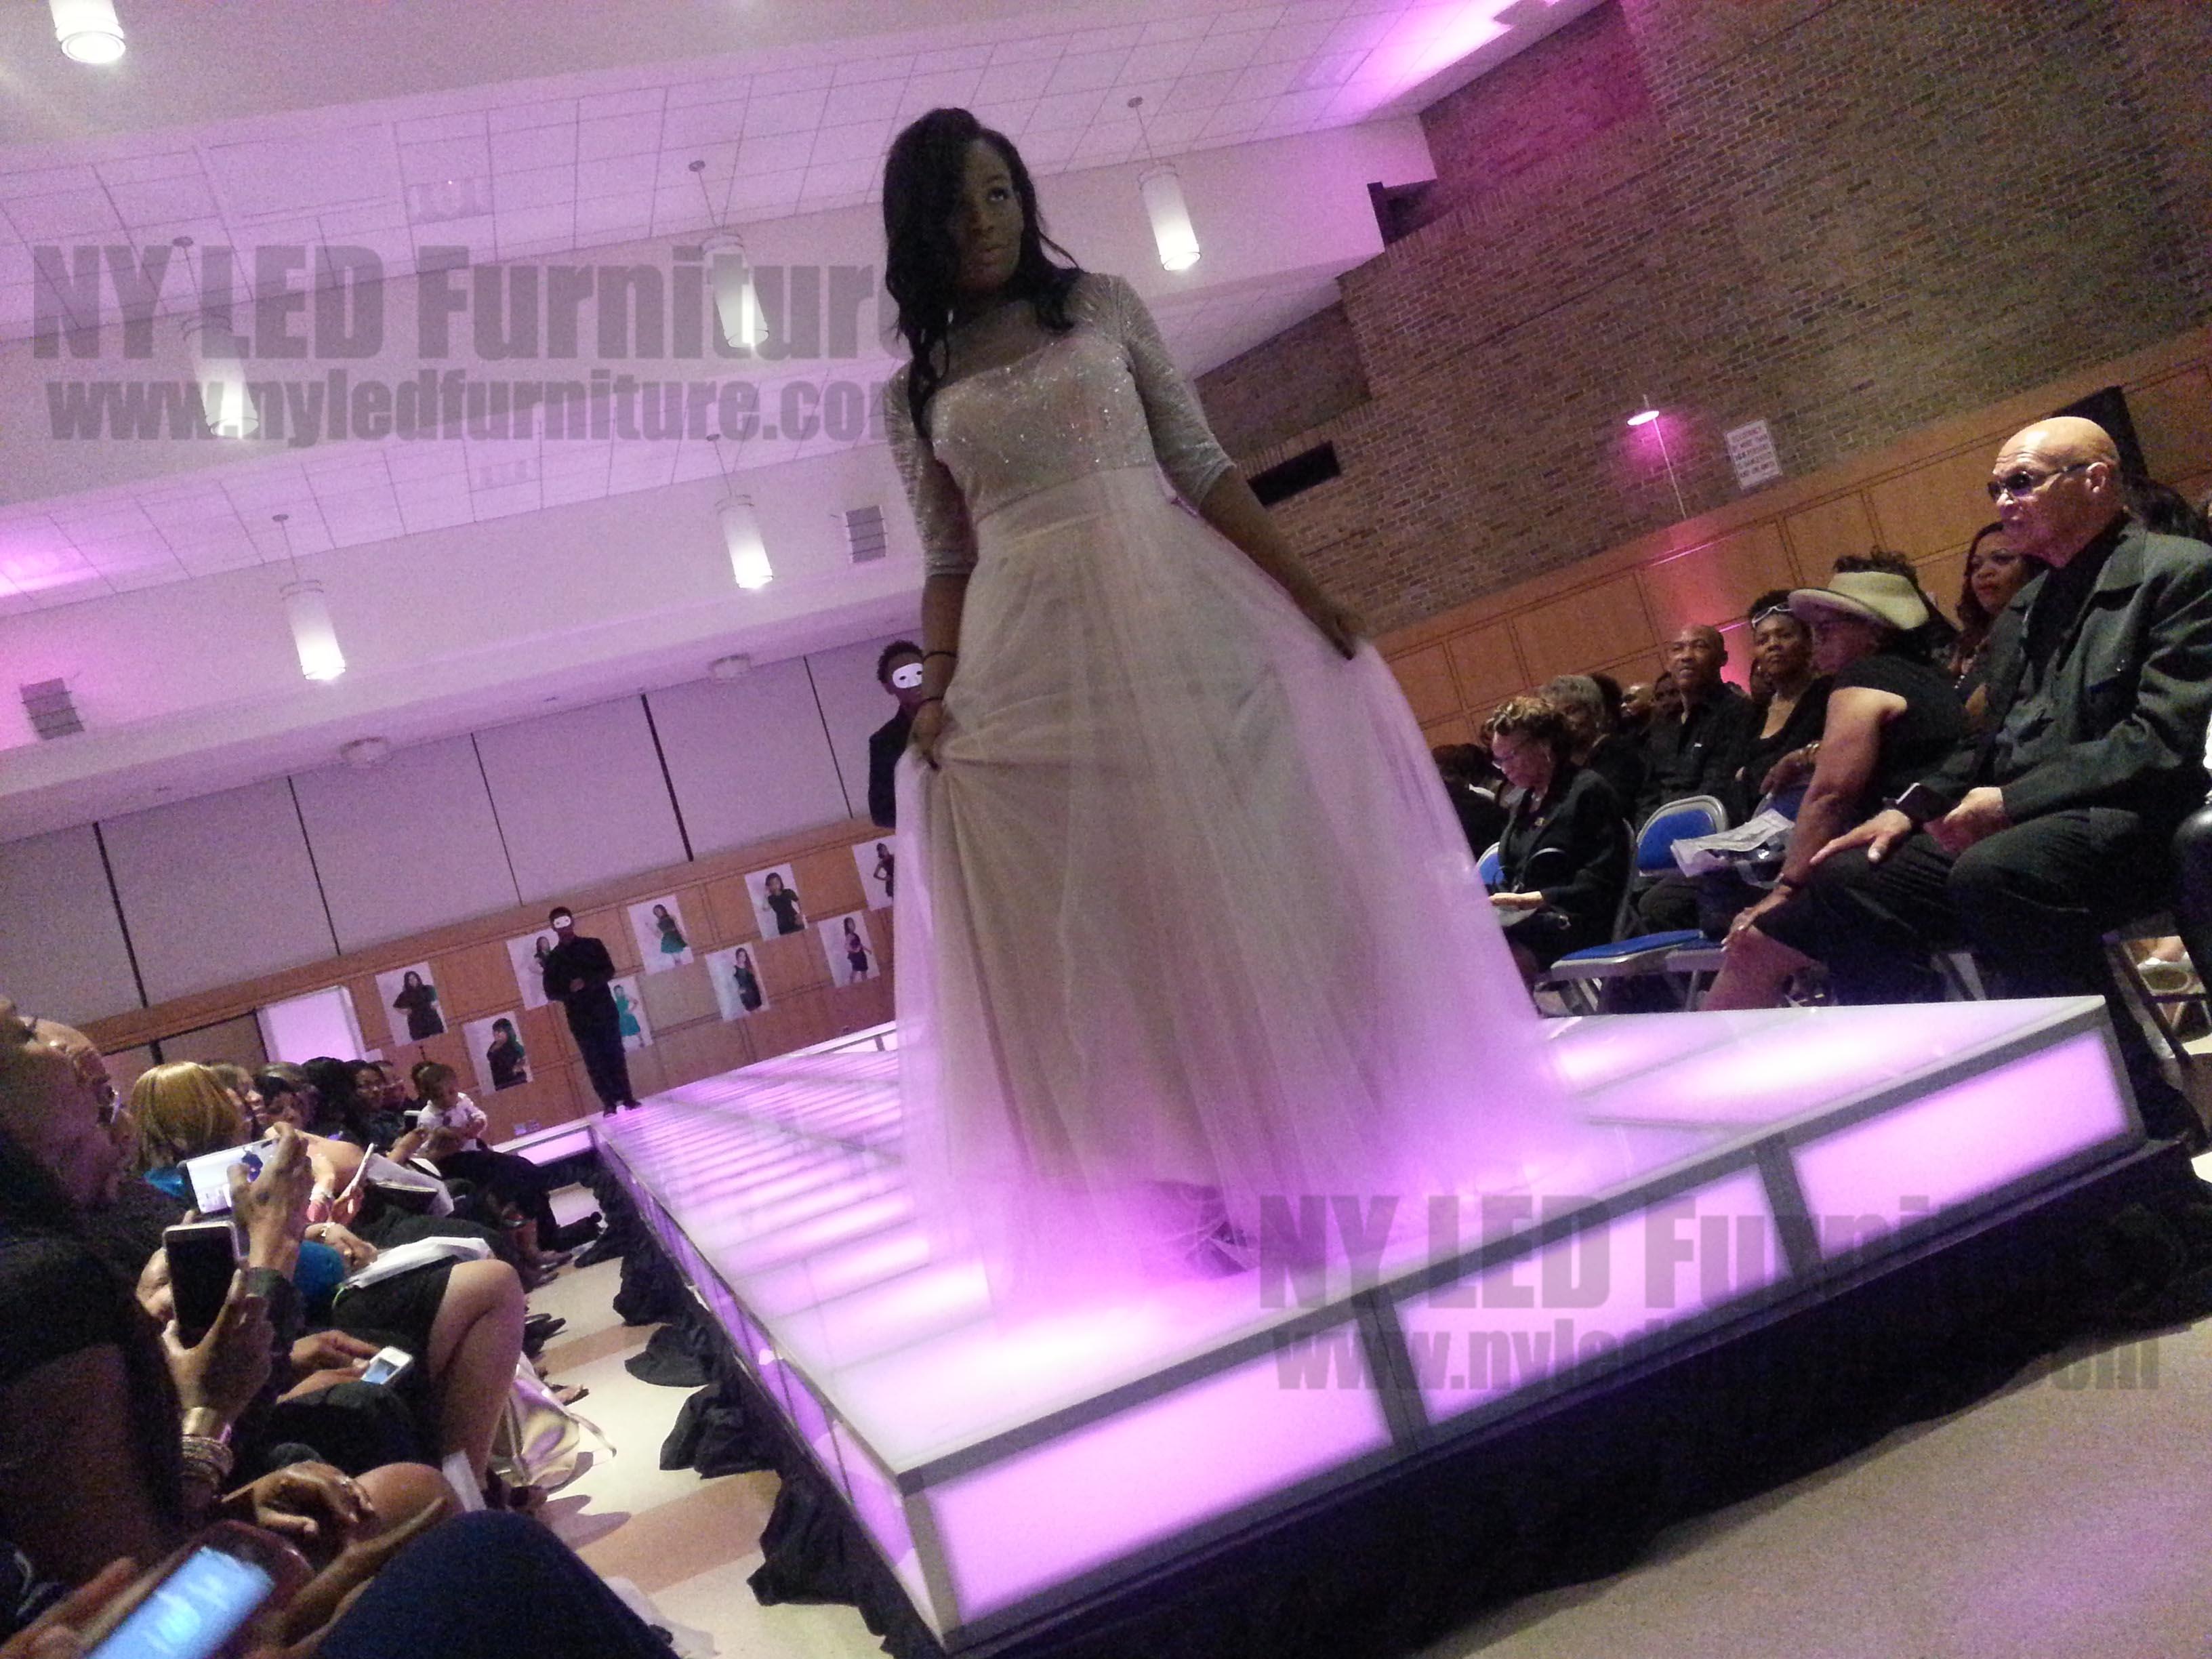 Lighted Catwalk Rental - Hofstra College - Hempstead - NY